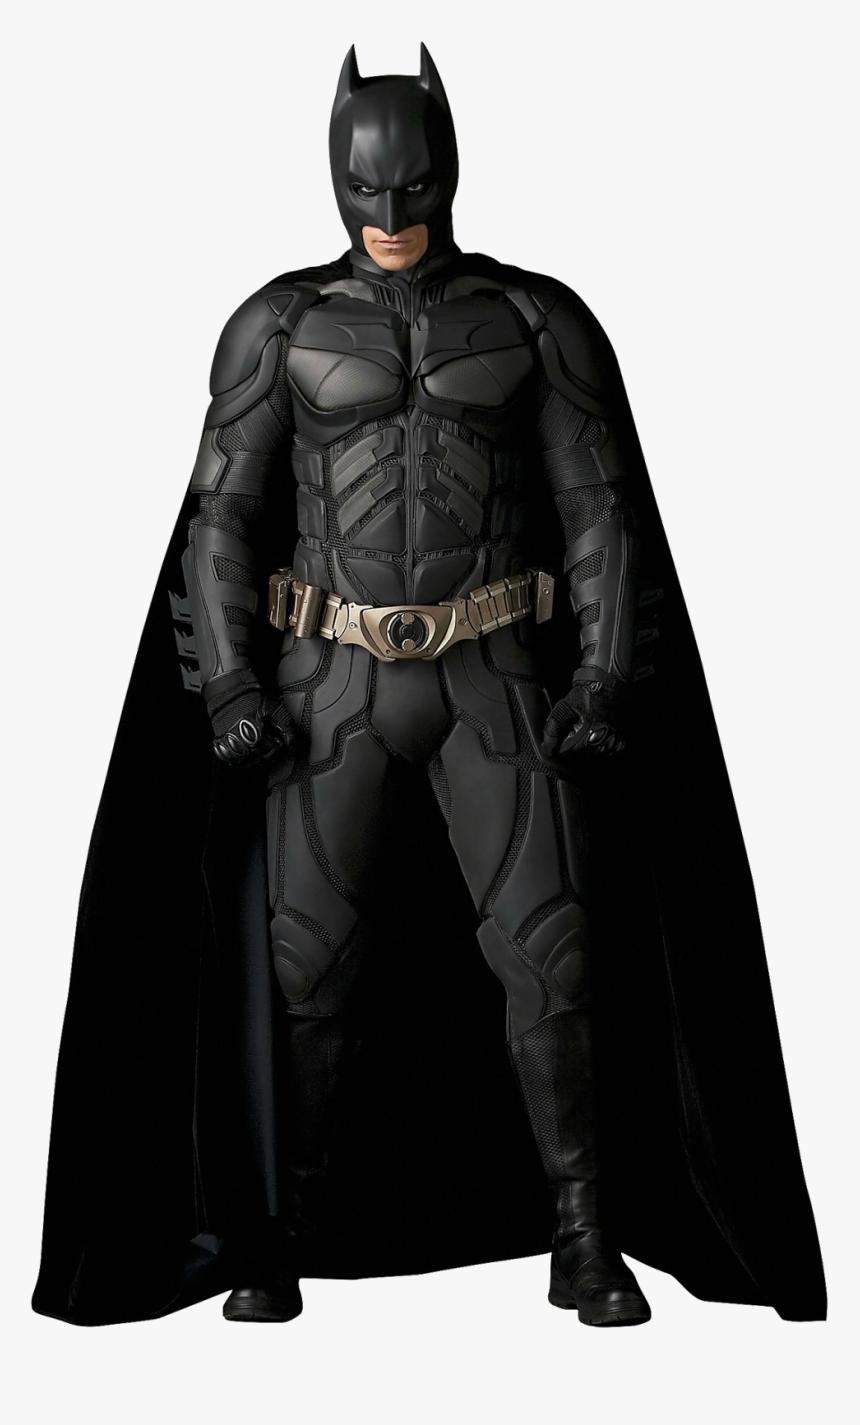 Black Knight Transparent - Dark Knight Batman Png, Png Download, Free Download